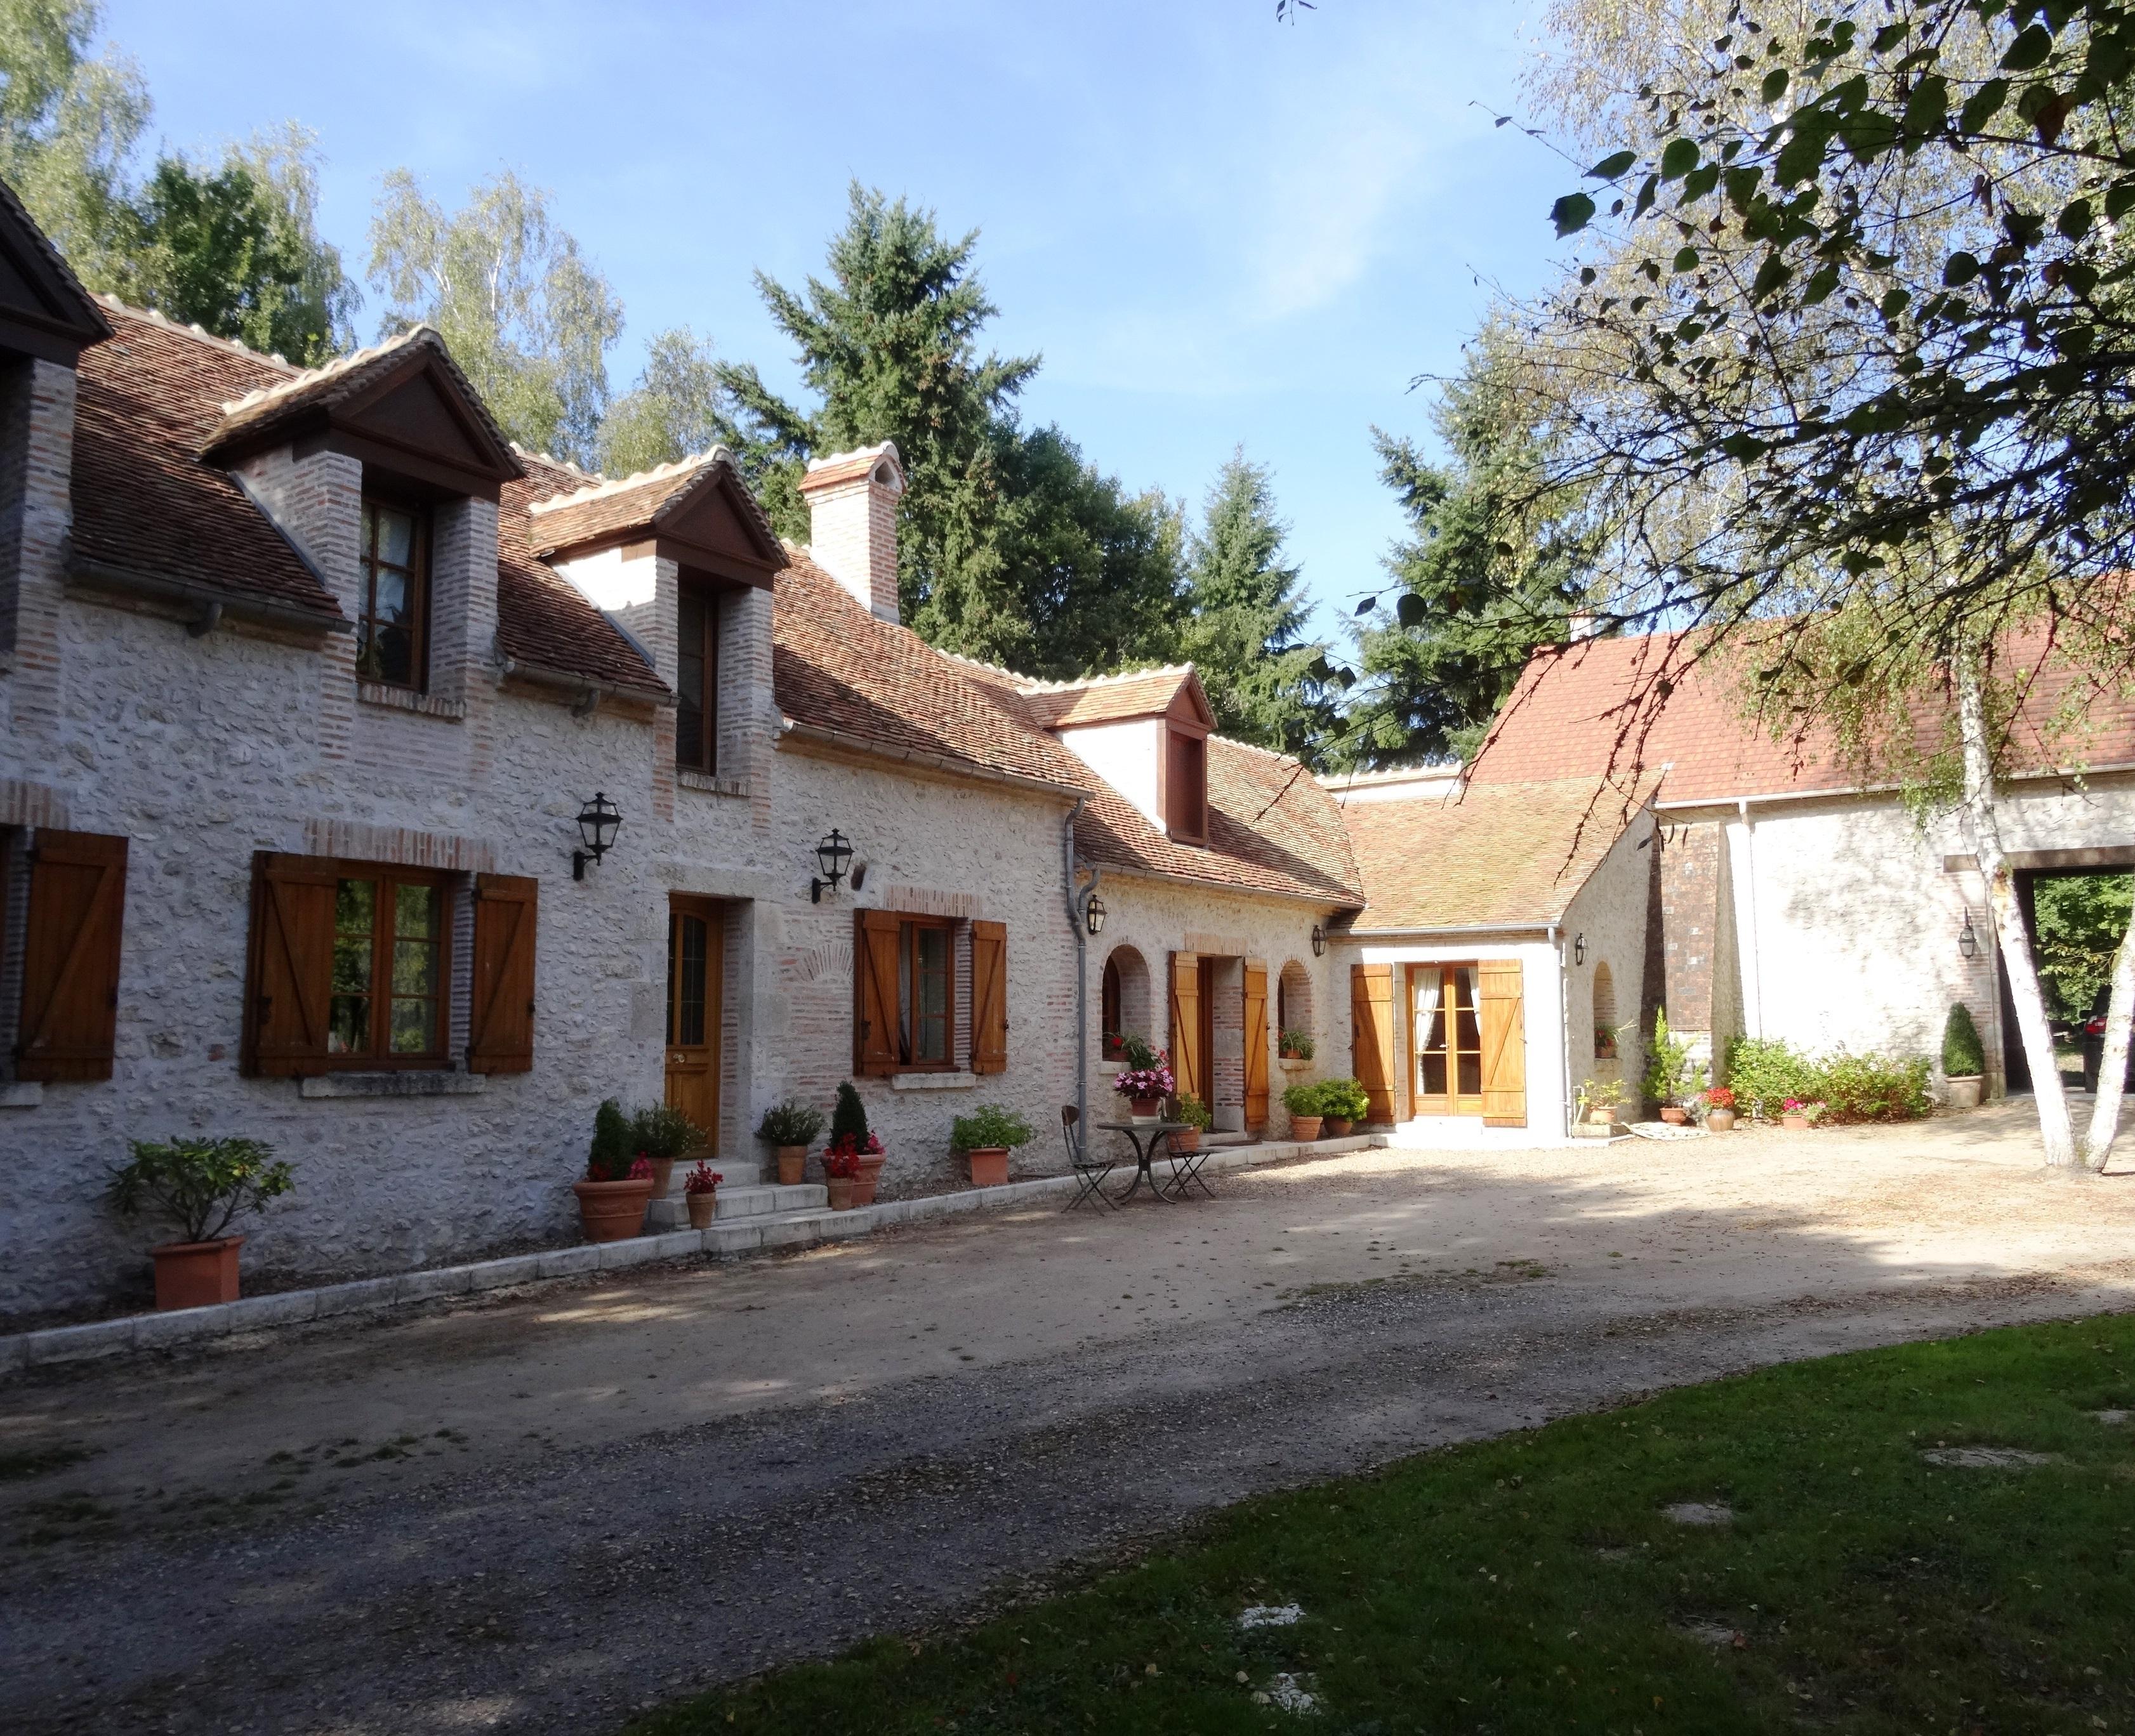 Casa Unifamiliar por un Venta en Propriete Sologne Ardon Other Centre, Centro 45160 Francia